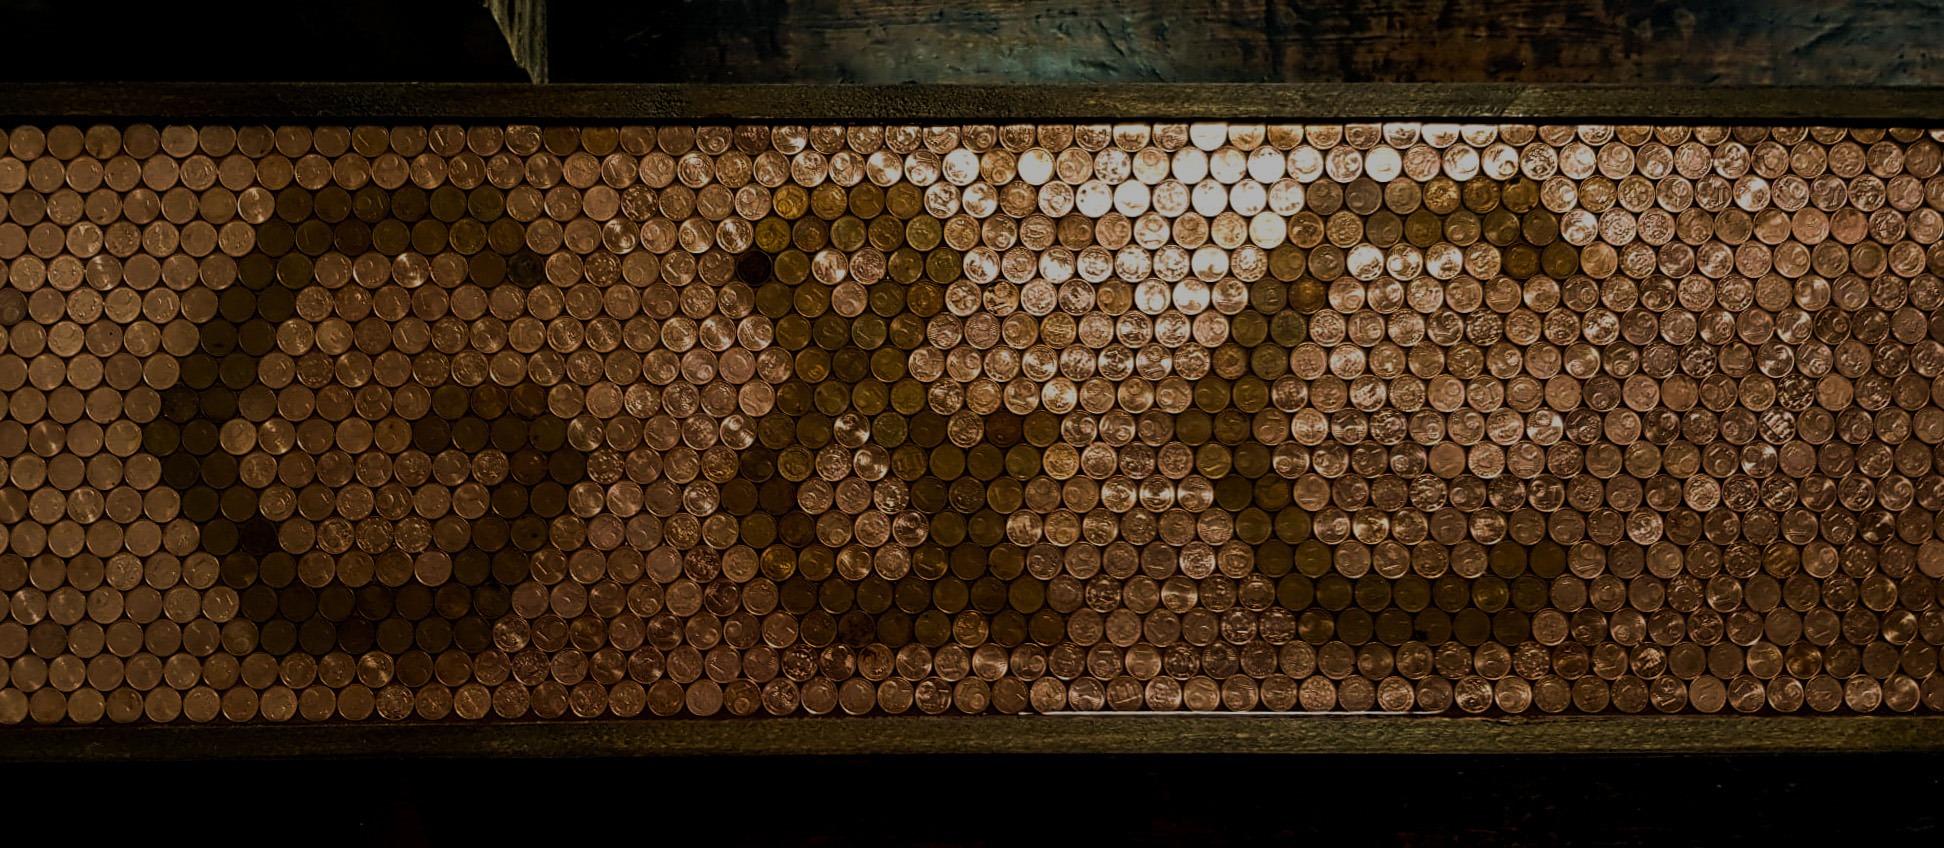 Gents&Crooks - De ingelegde G&C-bar